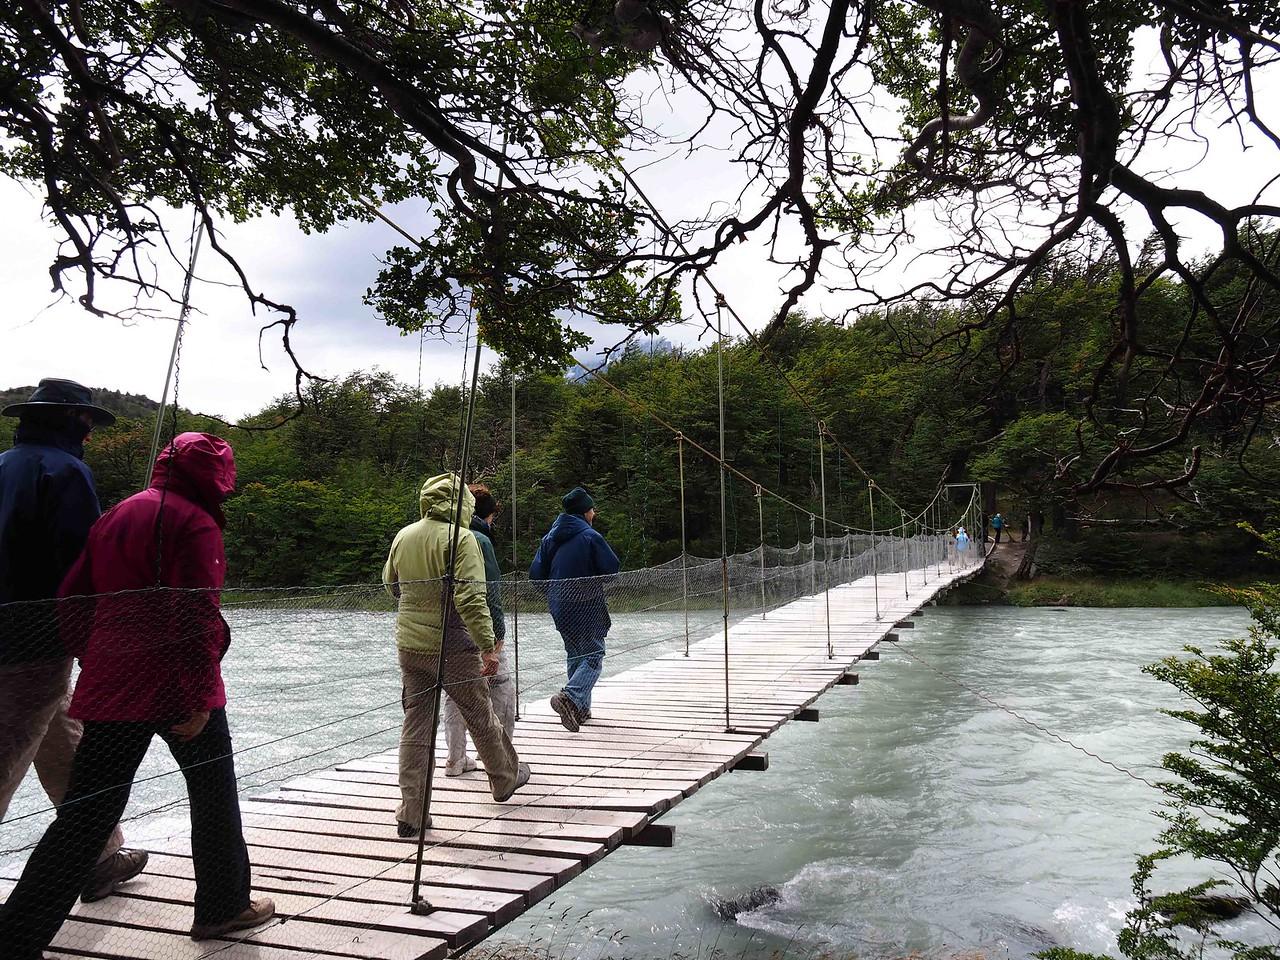 Across the Grey River on a swinging bridge in 50 mph winds